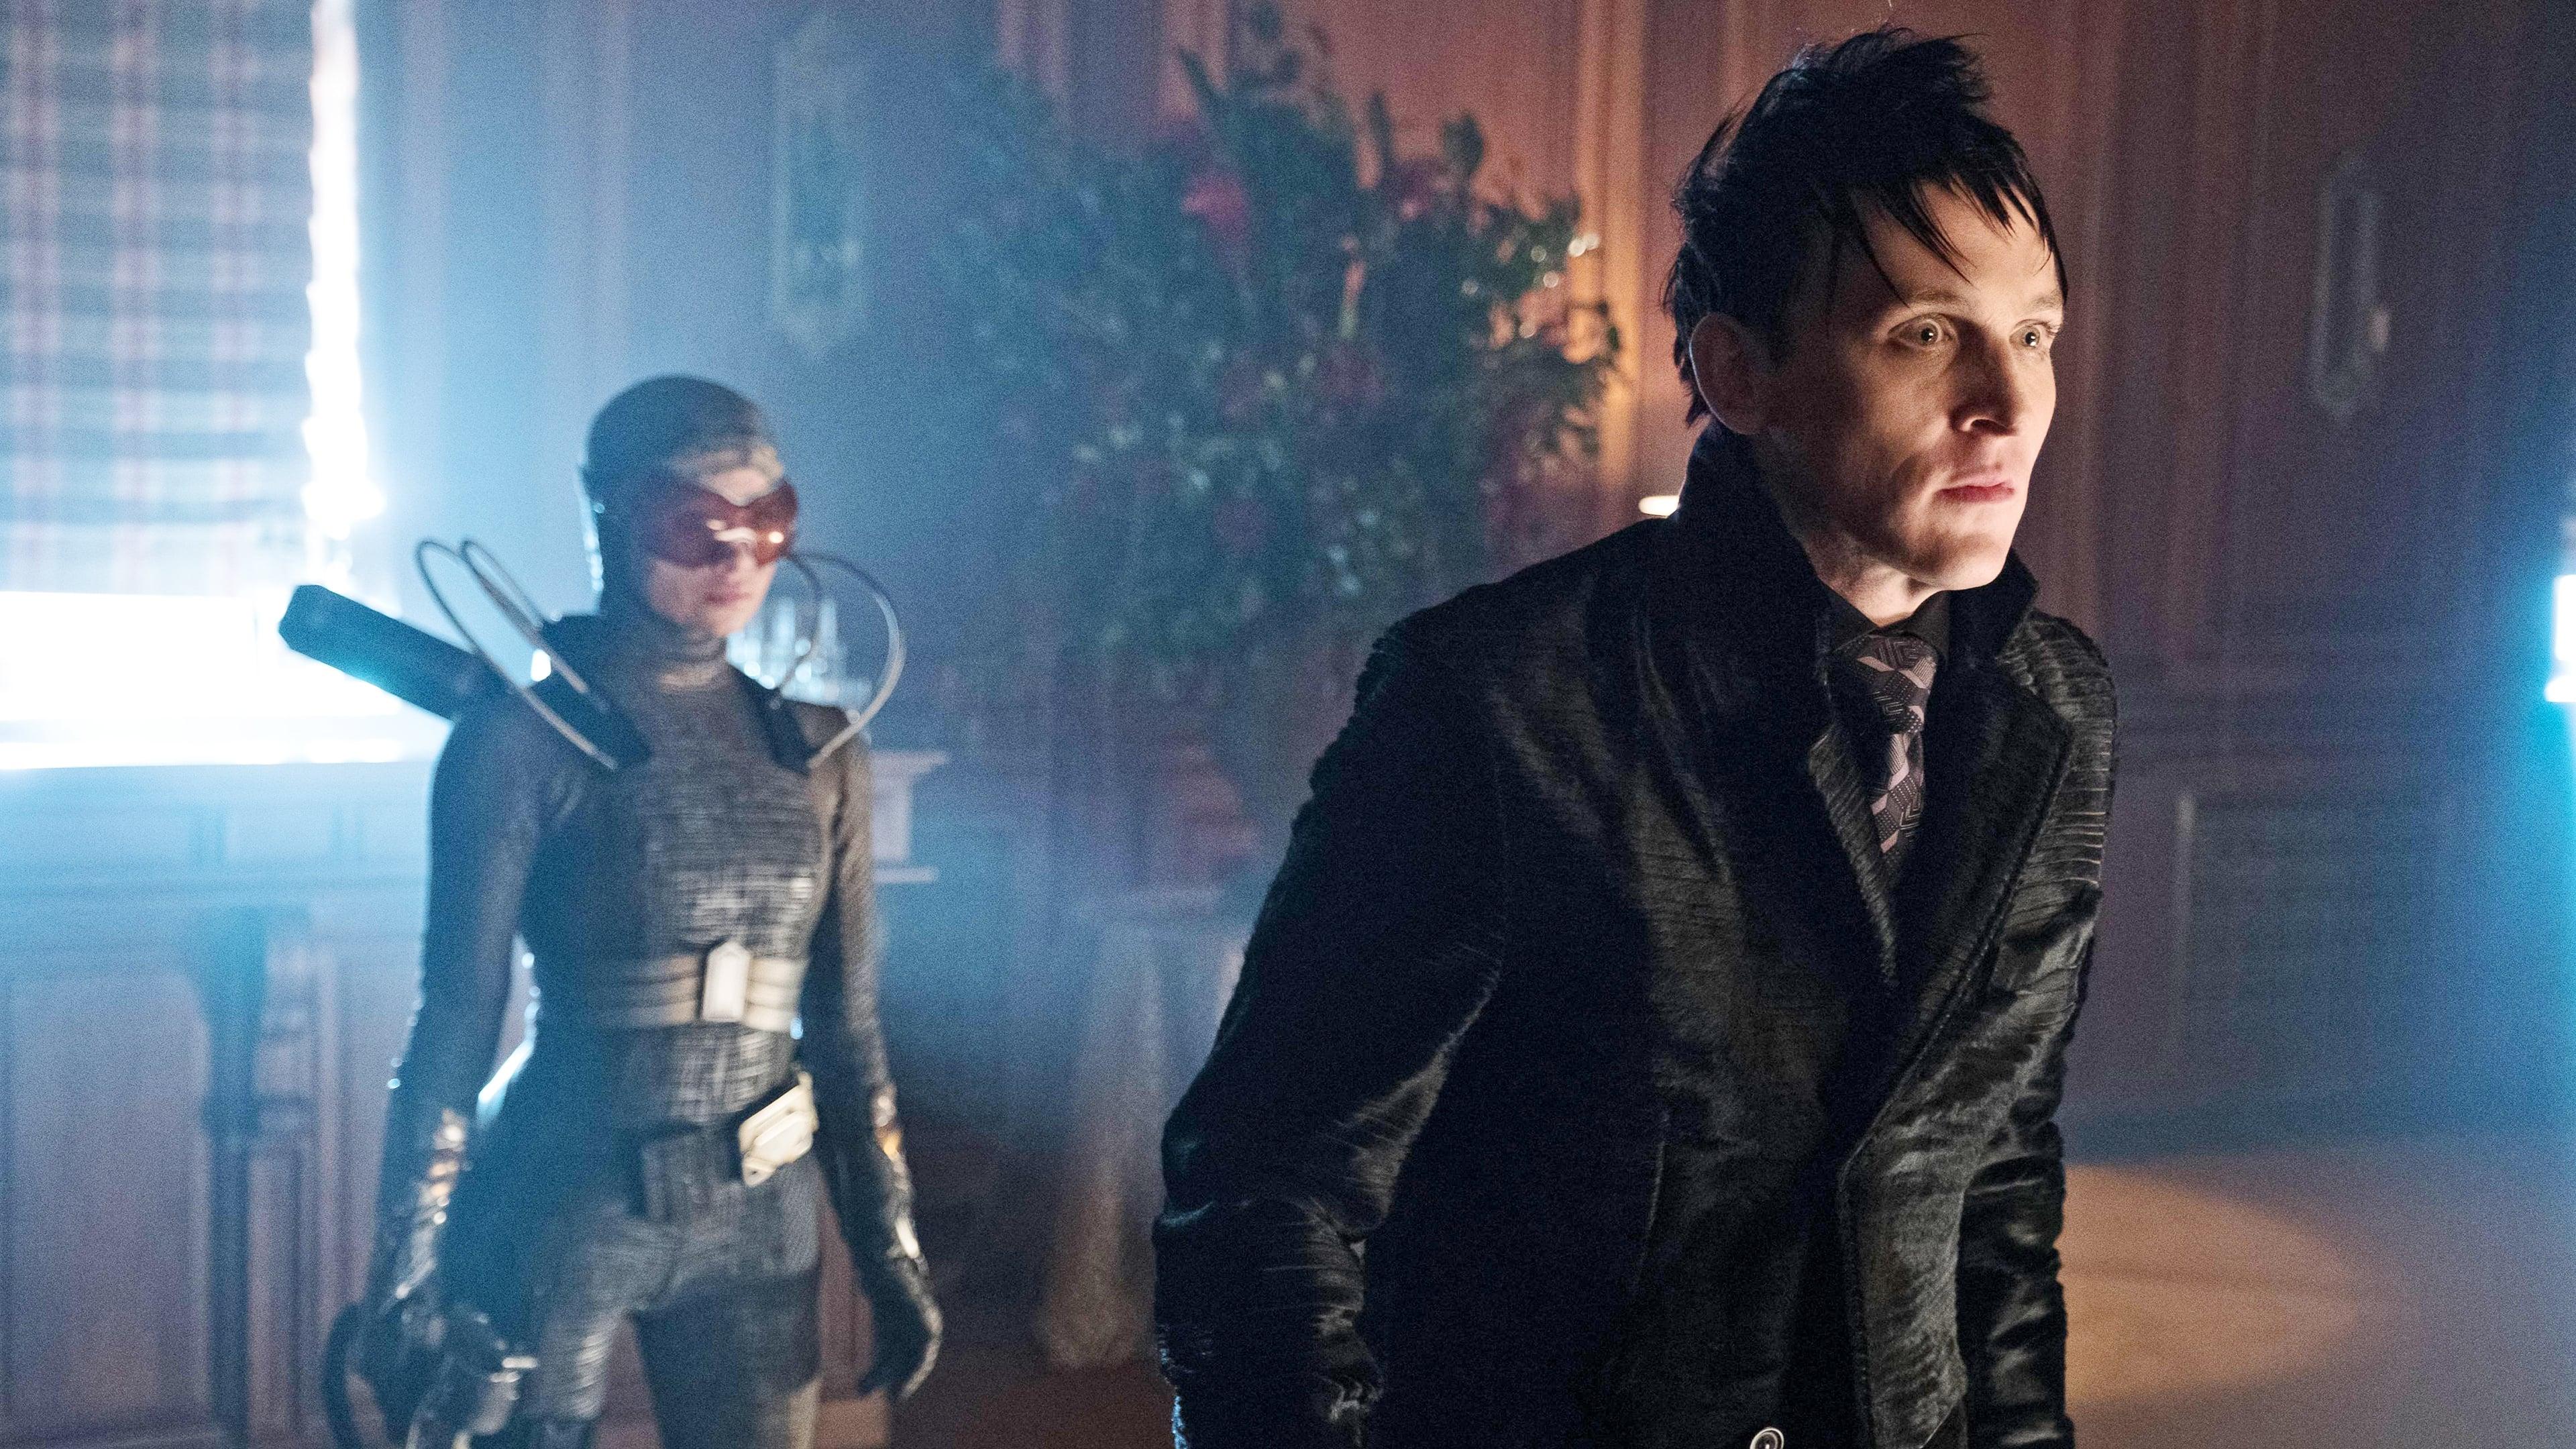 Watch Gotham S01E18 Season 1 Episode 18 - arawatch.video